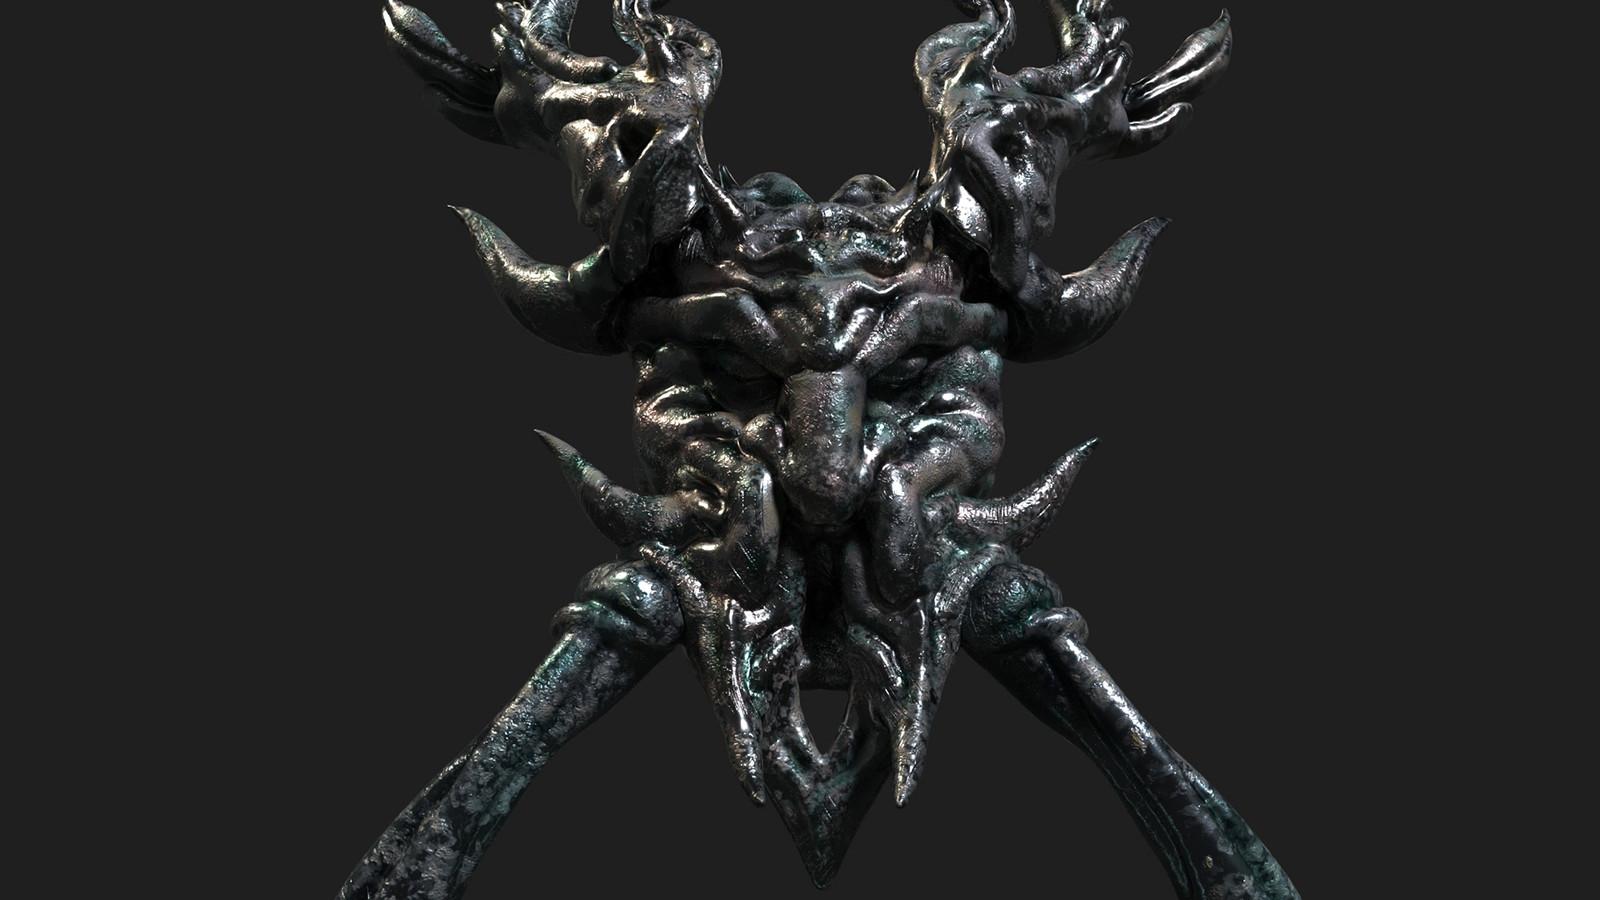 Gothic Fantasy Head Door Knob Game-ready 3D Asset (UE4)